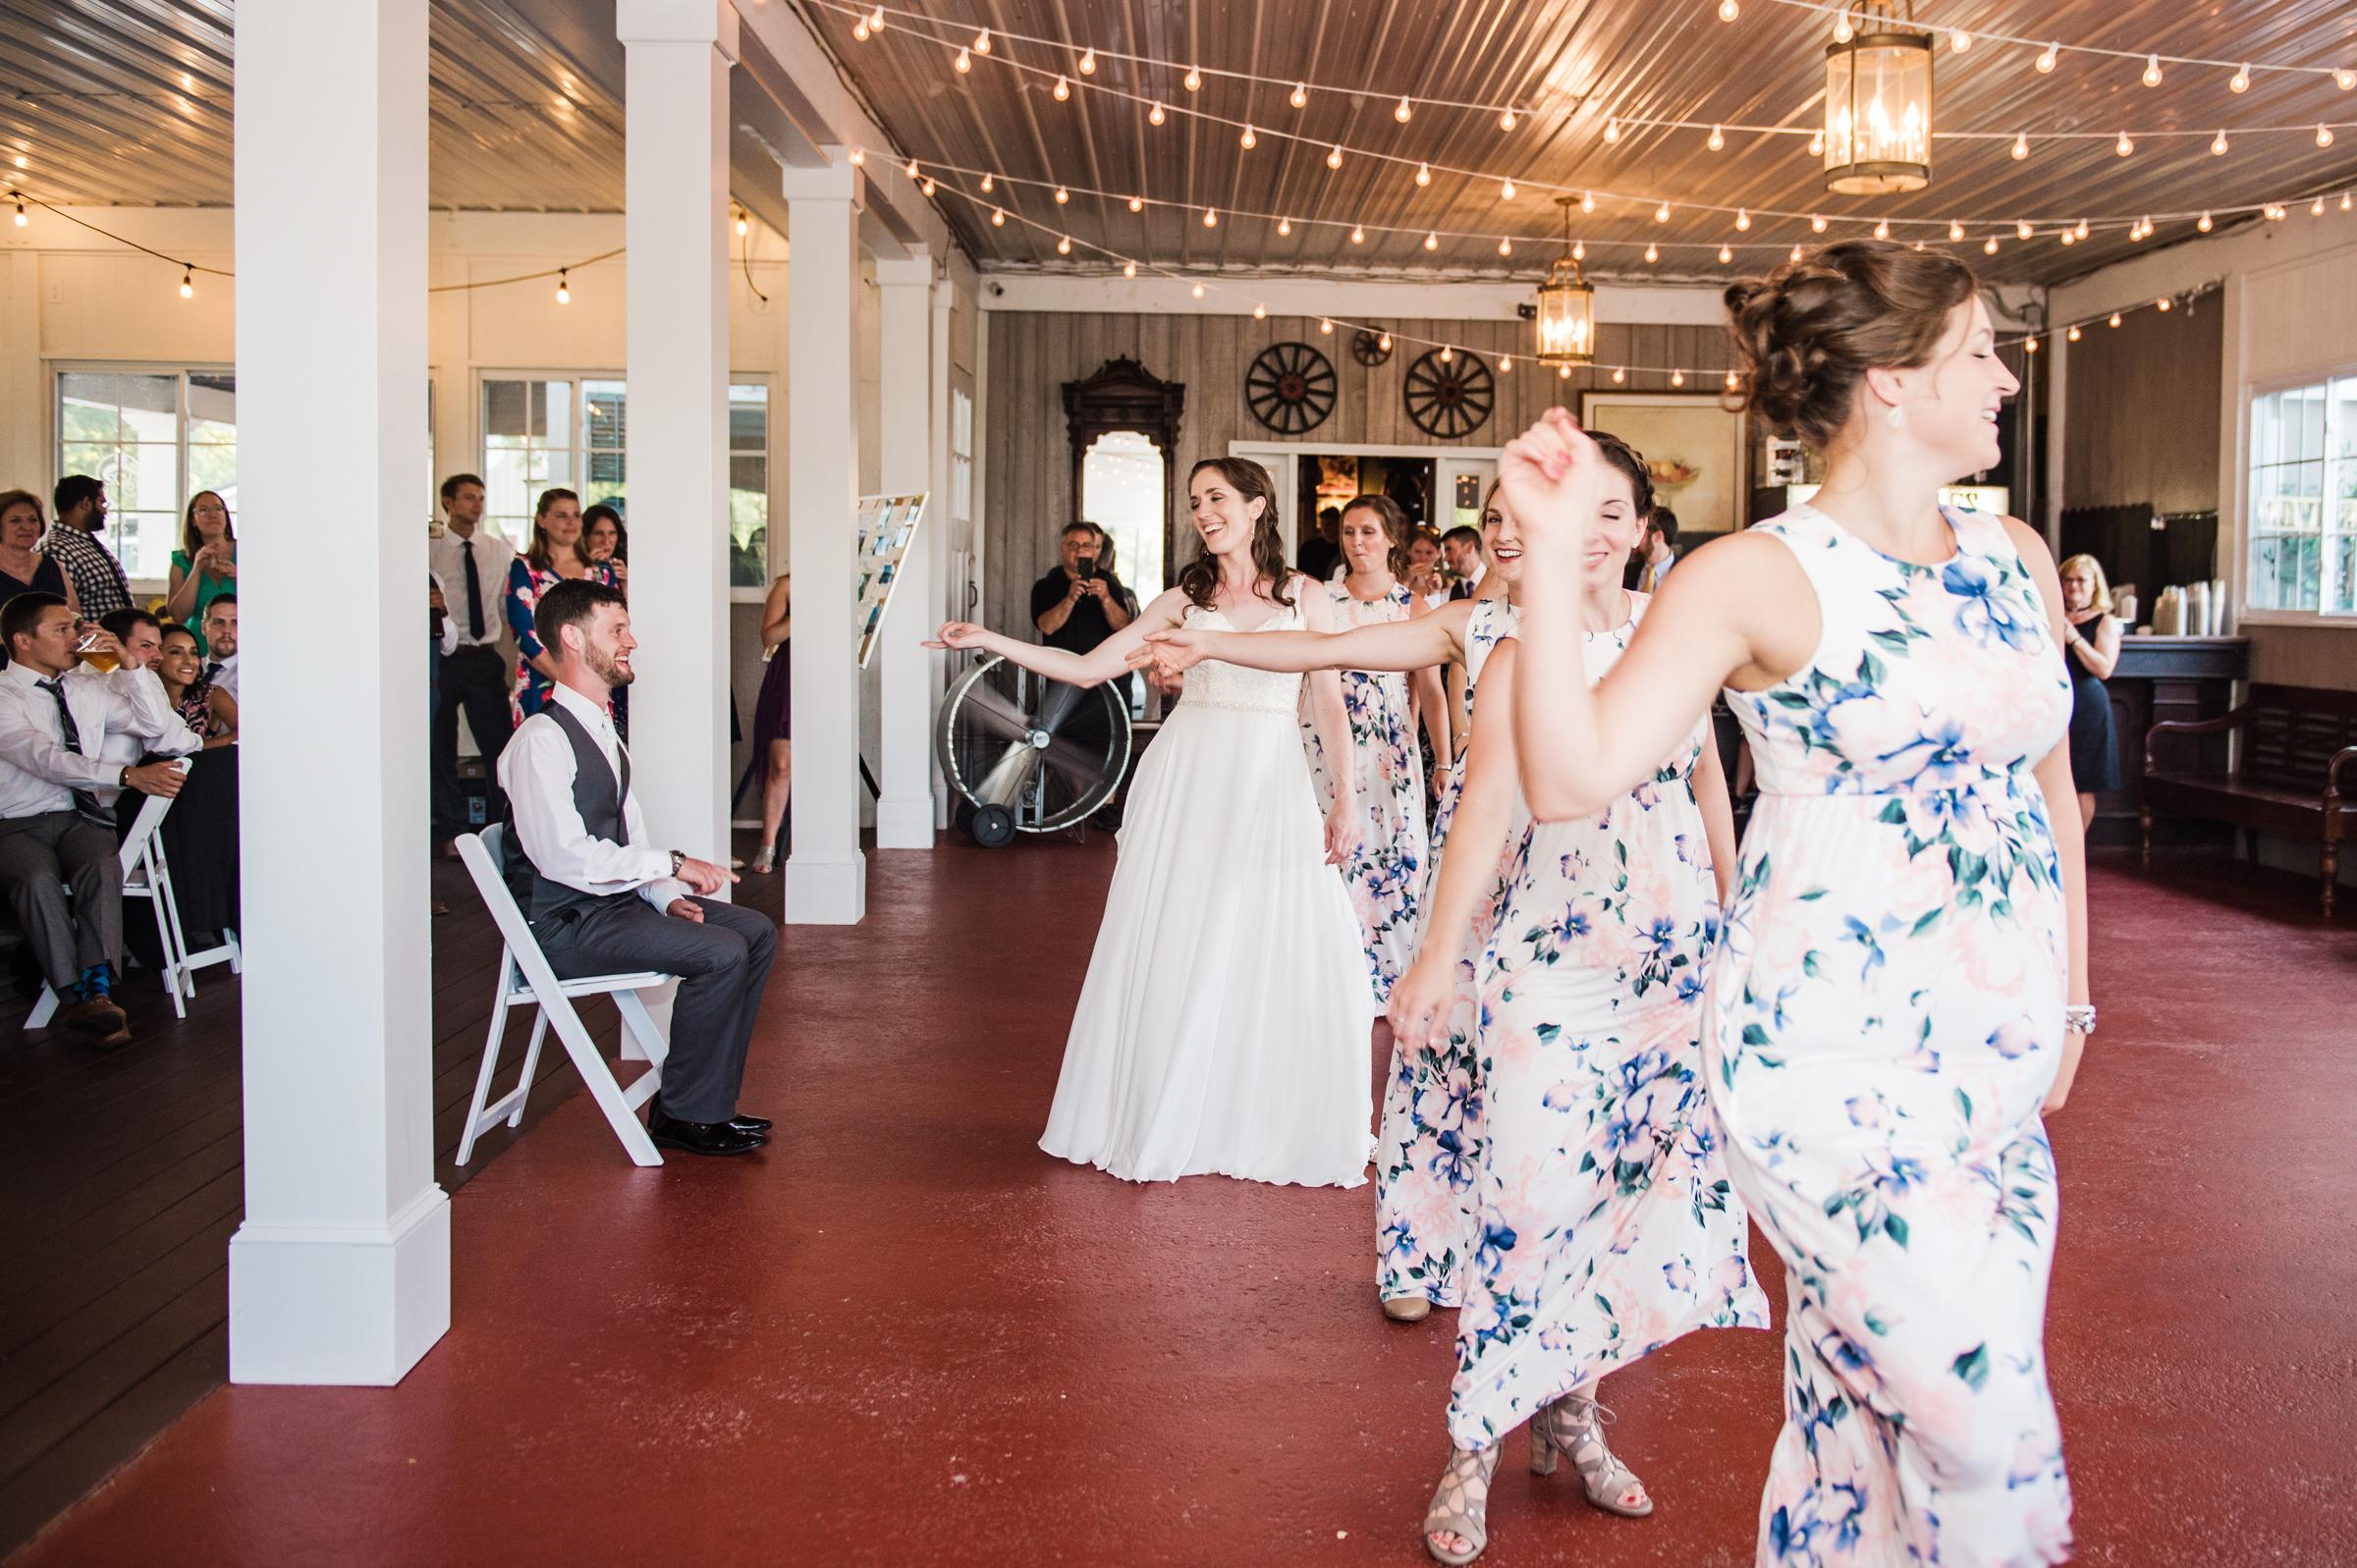 Jerris_Wadsworth_Wedding_Barn_Rochester_Wedding_JILL_STUDIO_Rochester_NY_Photographer_DSC_2937.jpg